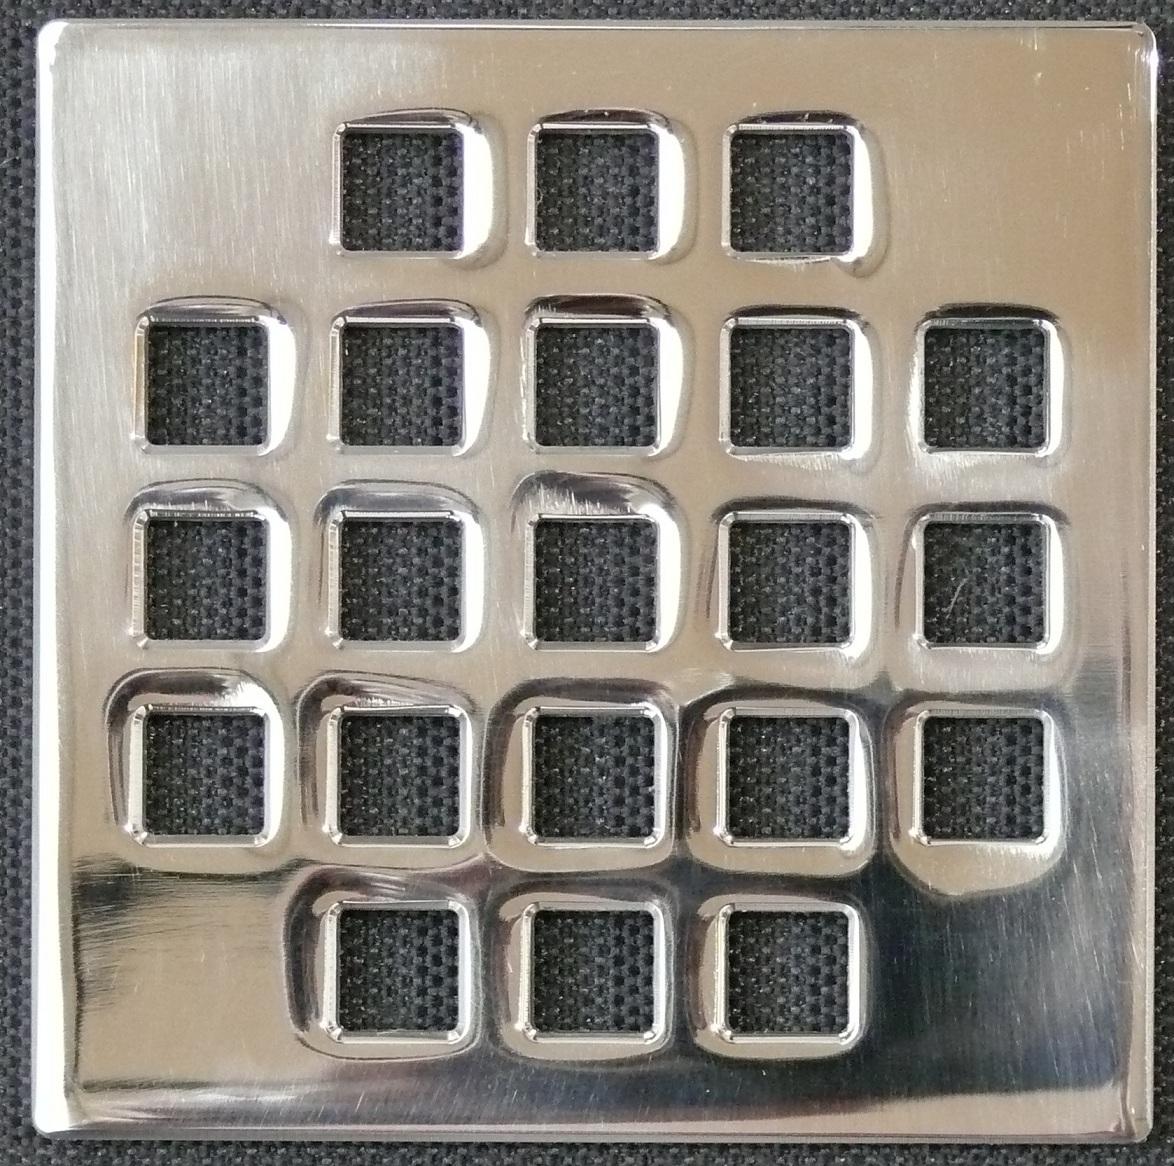 Ebbe Unique Square Shower Drain Polished Chrome - Classic